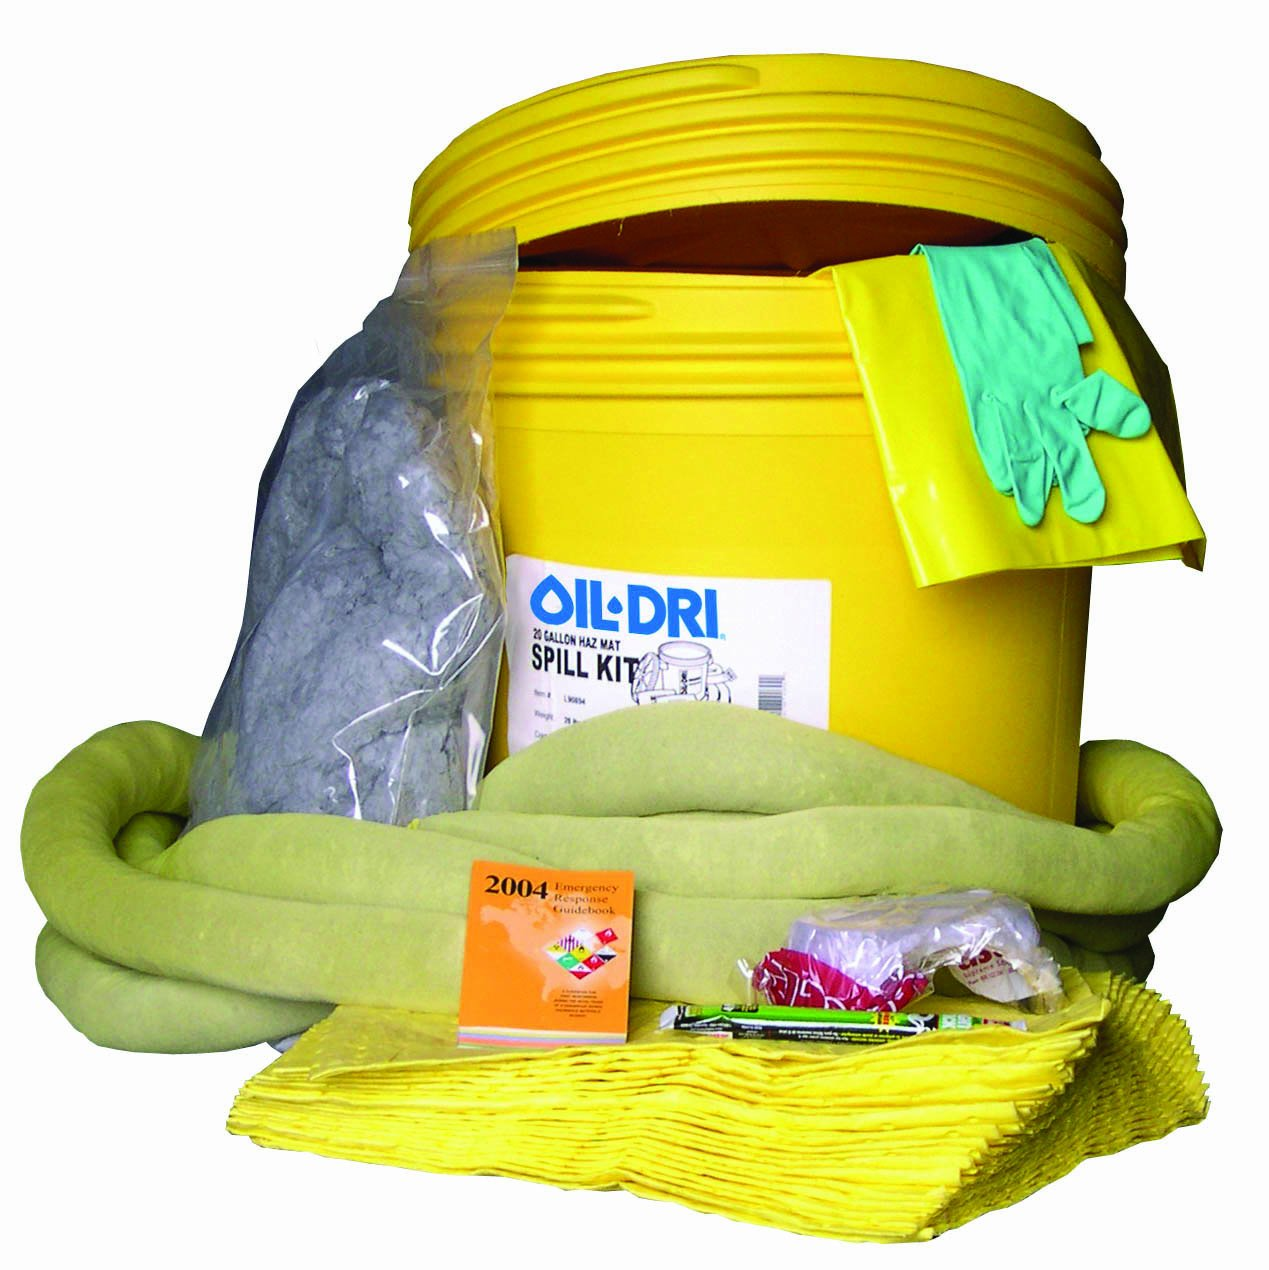 Oil-Dri L90894 20 gallon Hazardous Material Spill Kit: Industrial Spill Response Kits: Industrial & Scientific